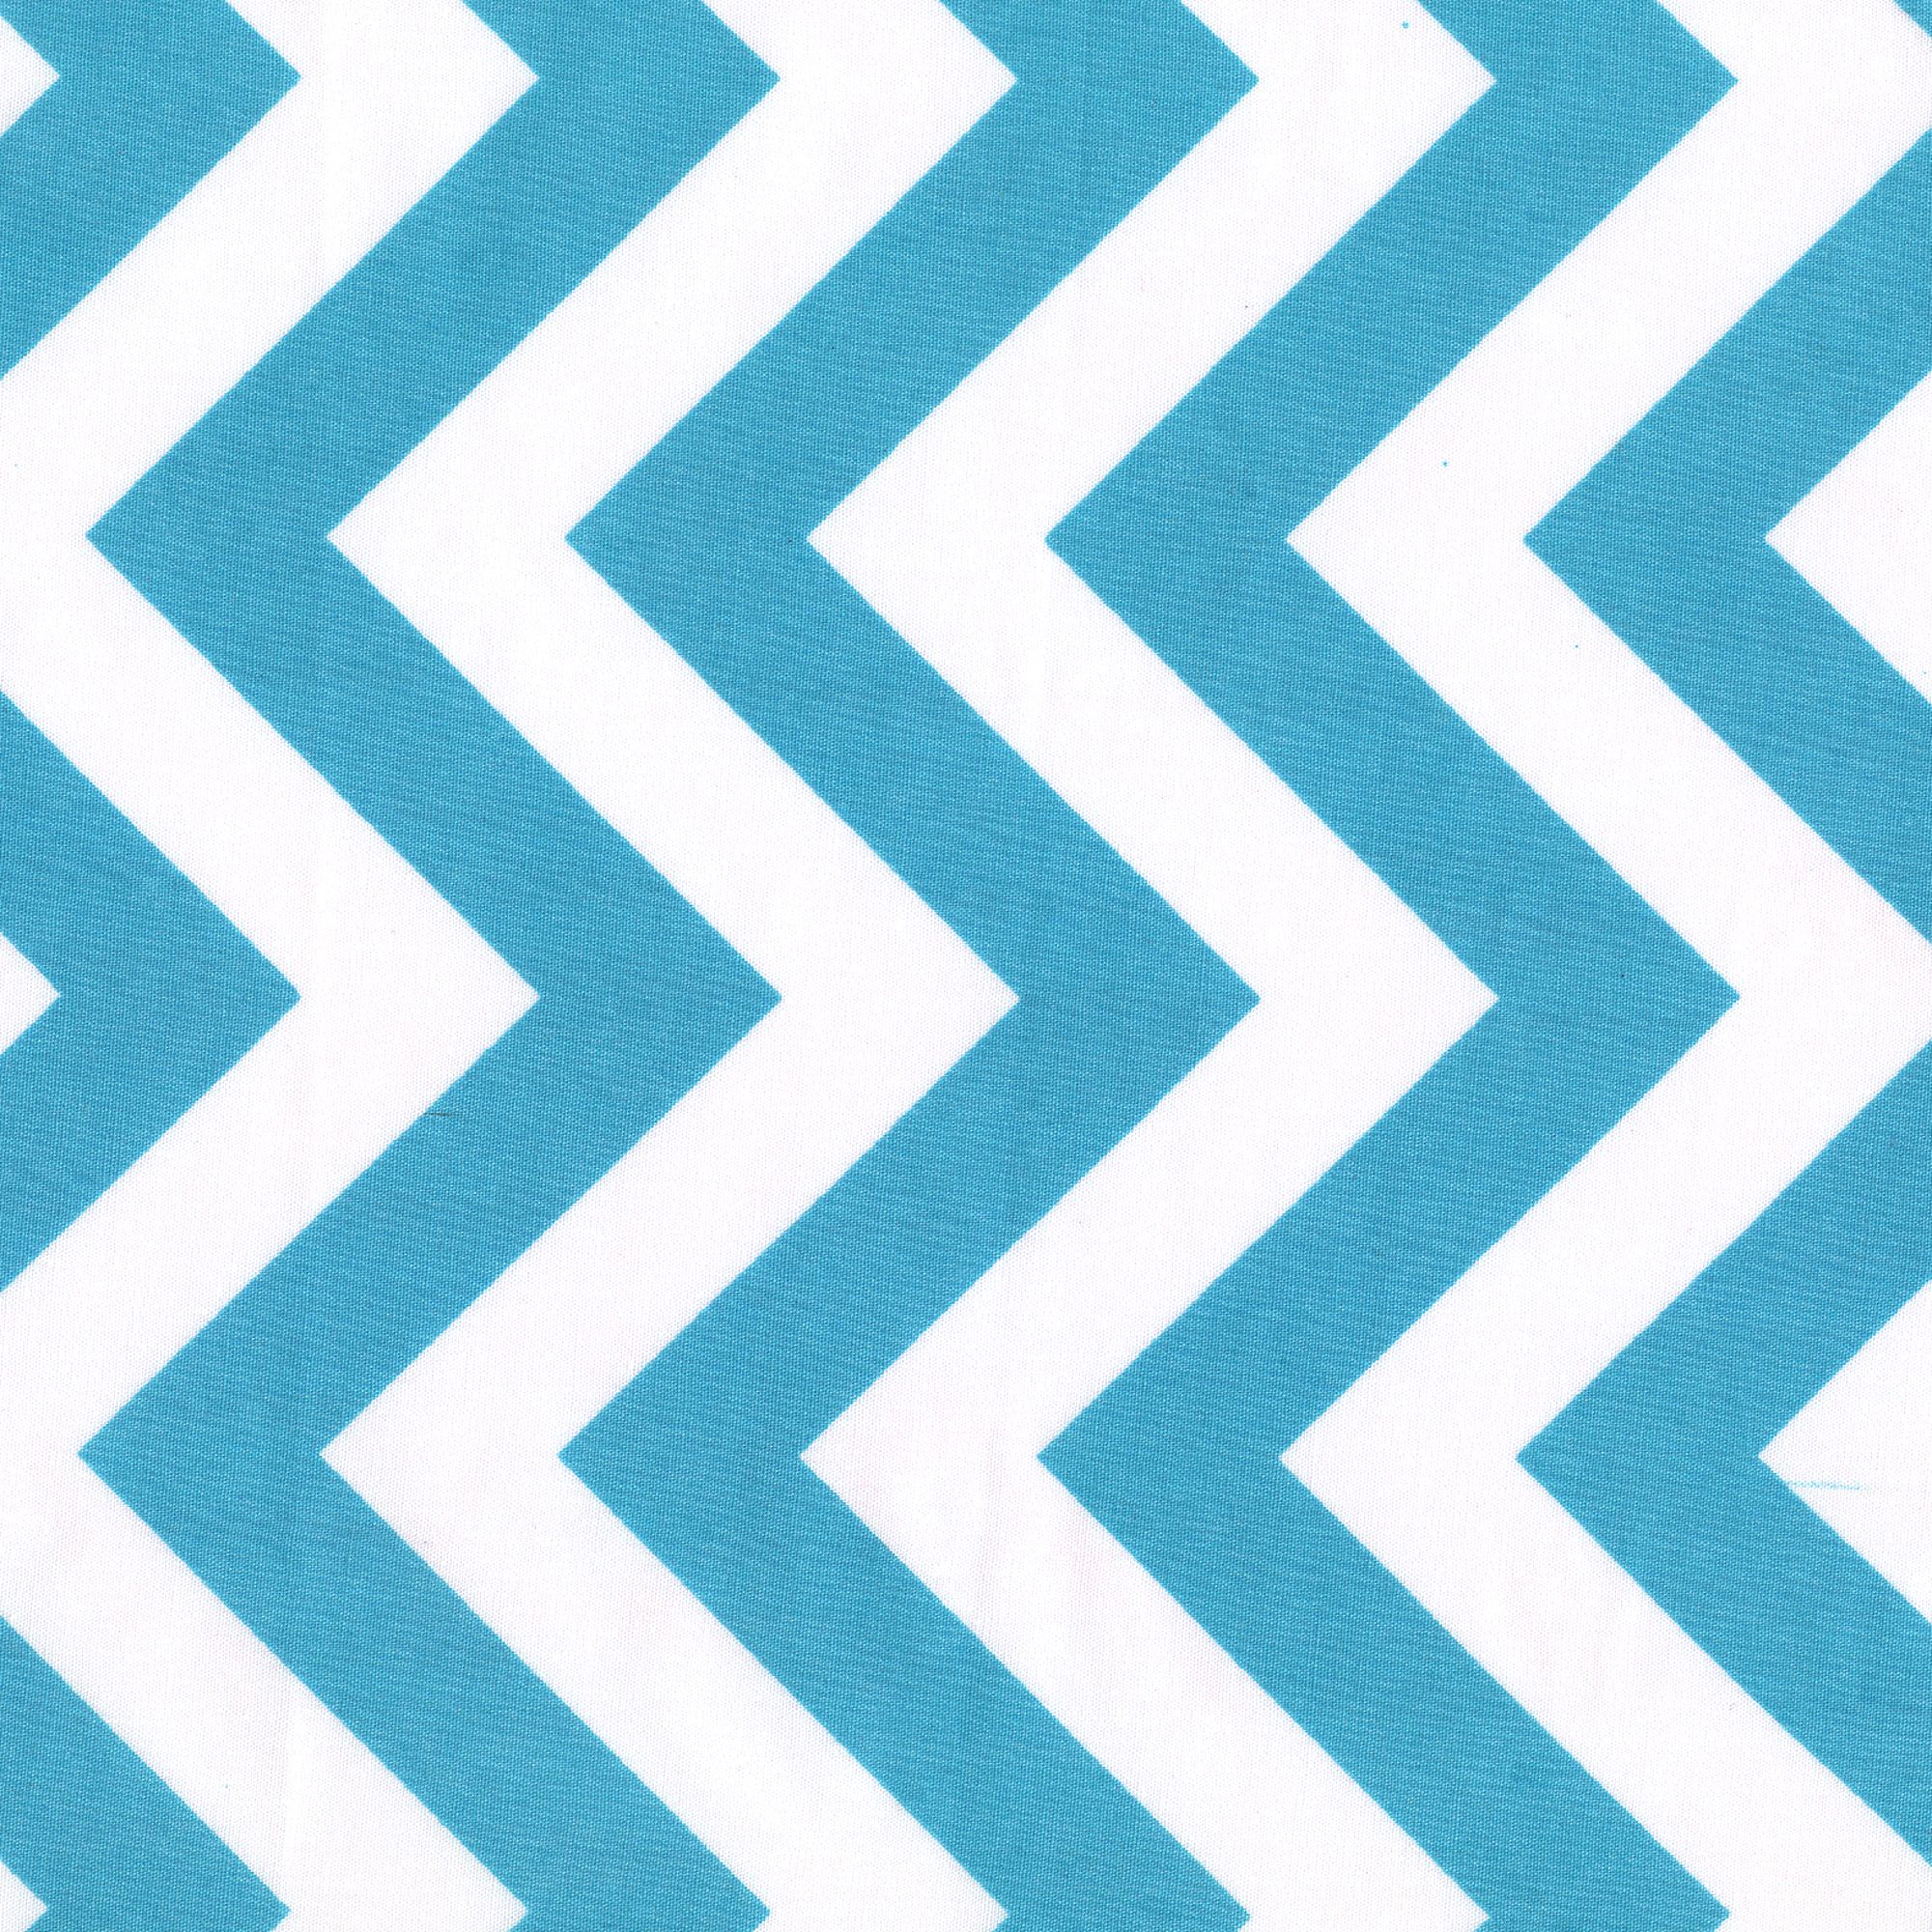 Shason Polycotton Fabric, per Yard